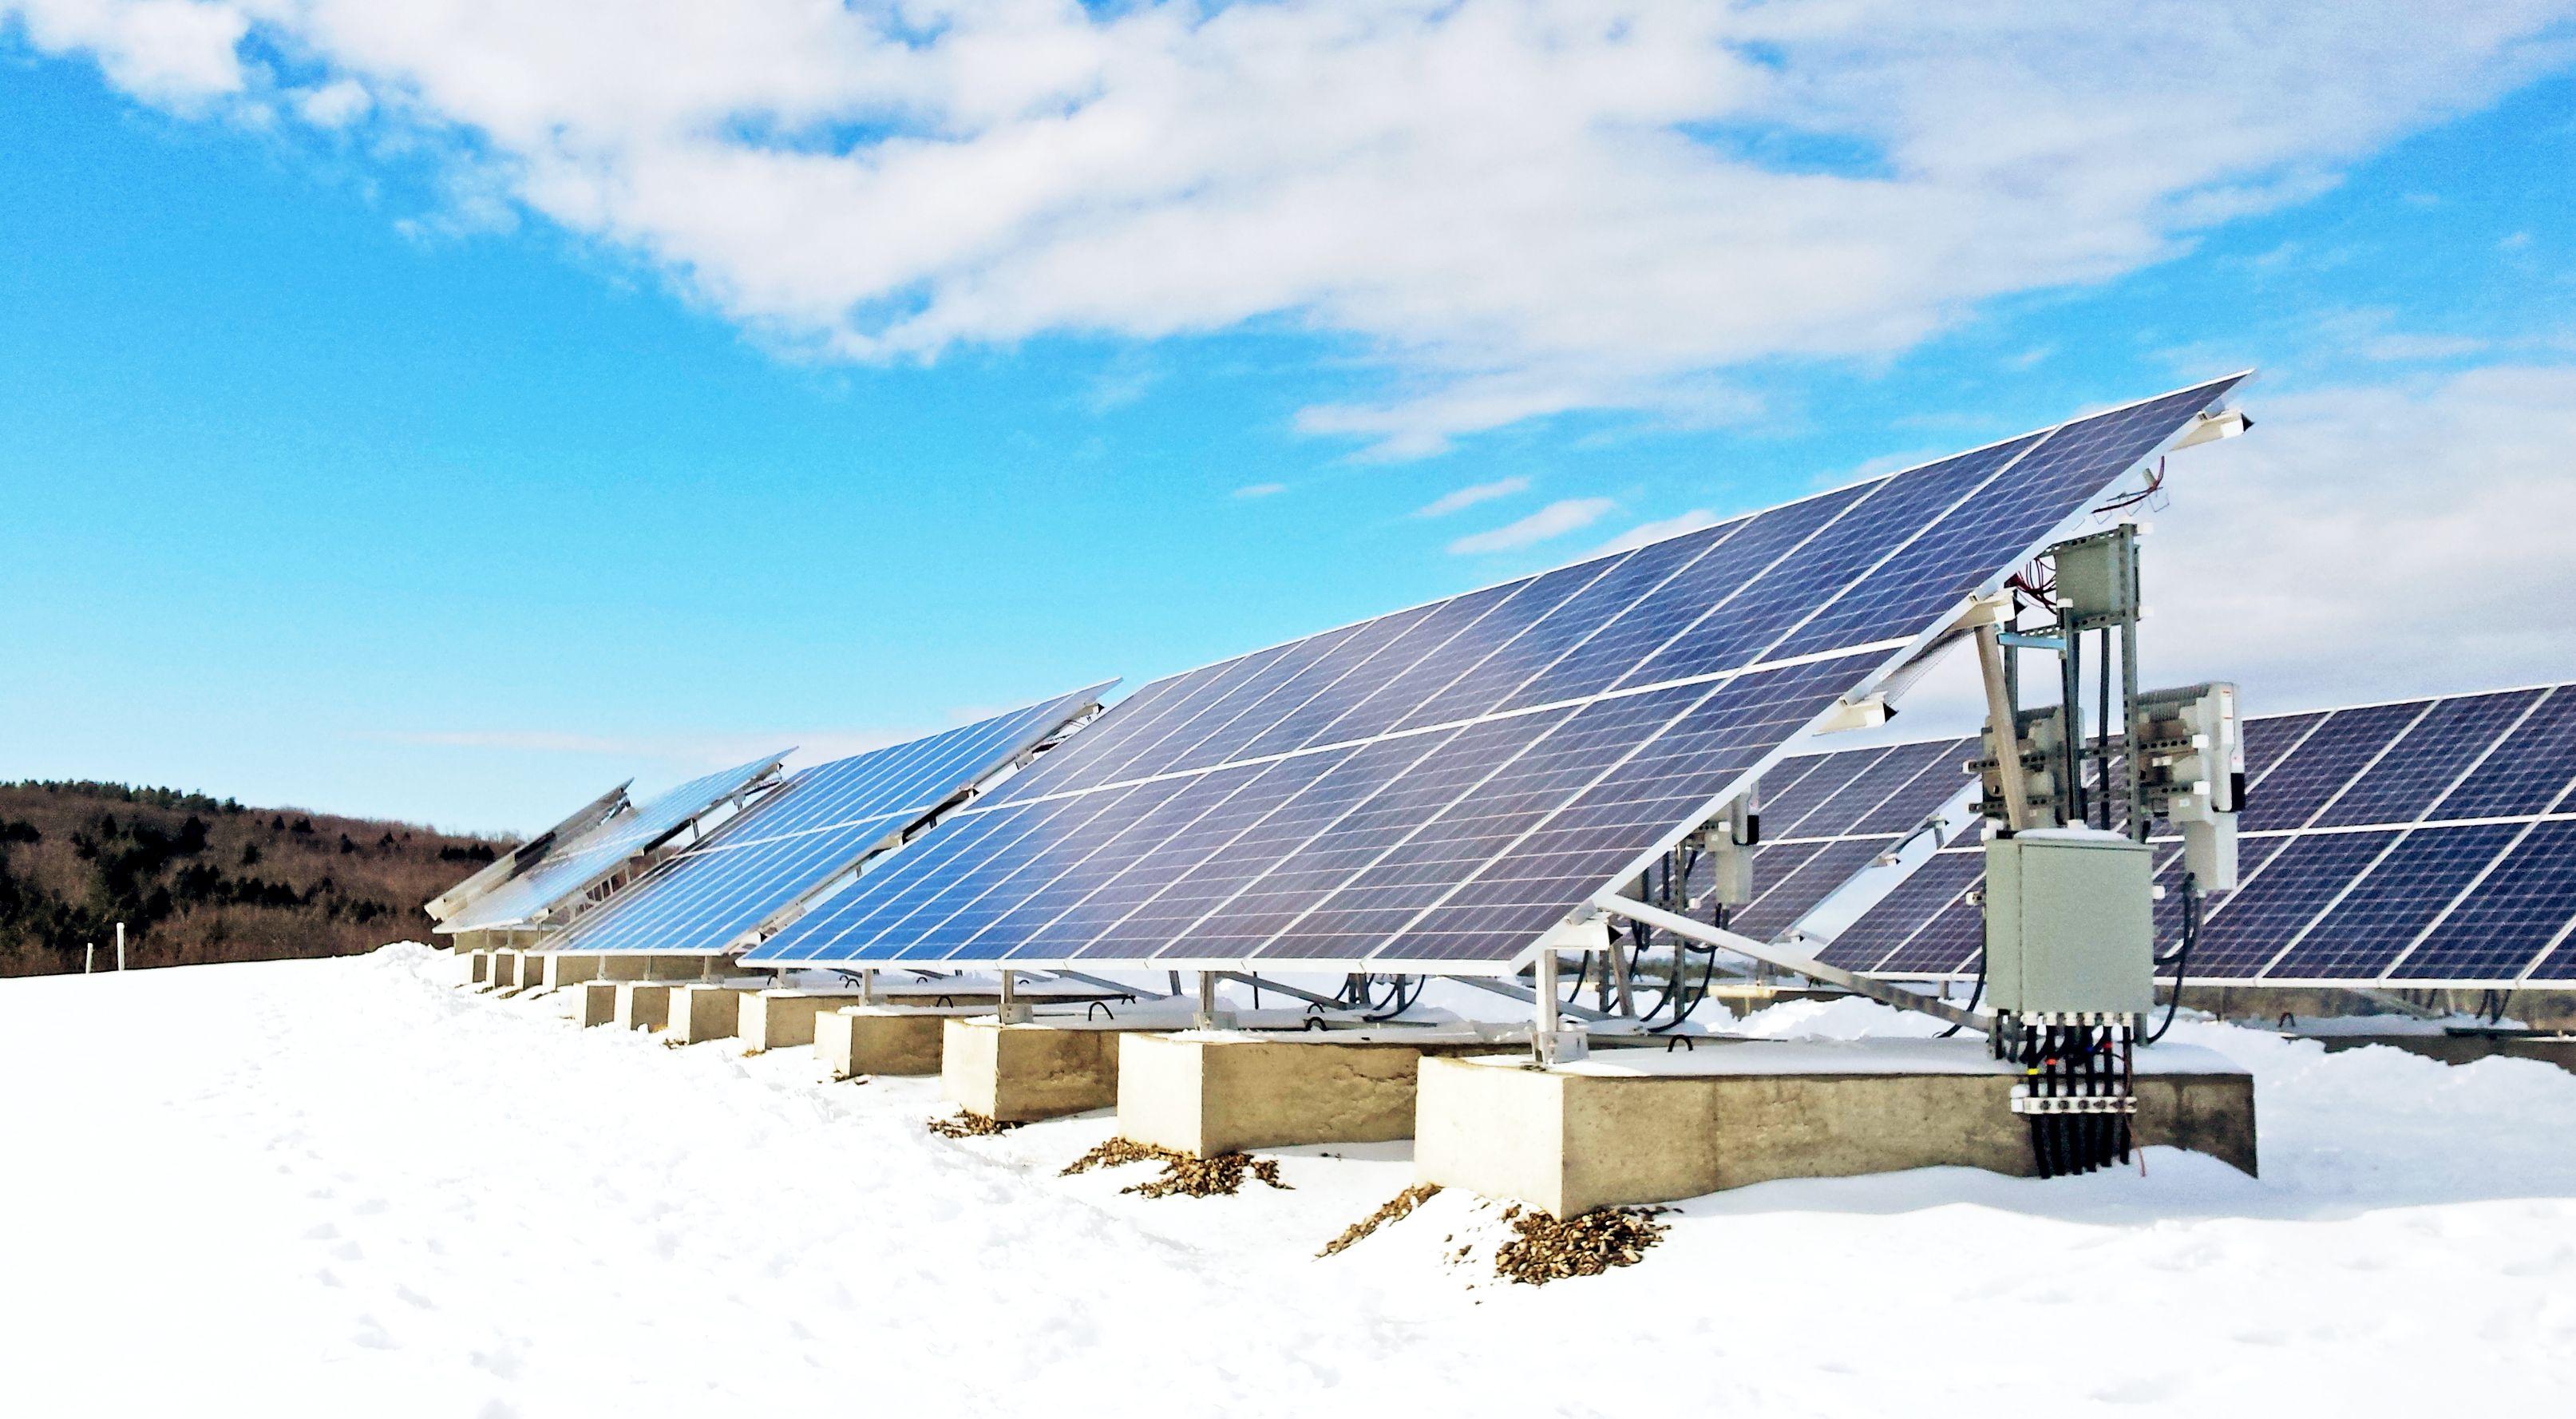 Https Www Revisionenergy Com Wp Content Uploads 2017 12 20151231 103255 2 Jpg Solar Solar Panel Cost Solar Panels